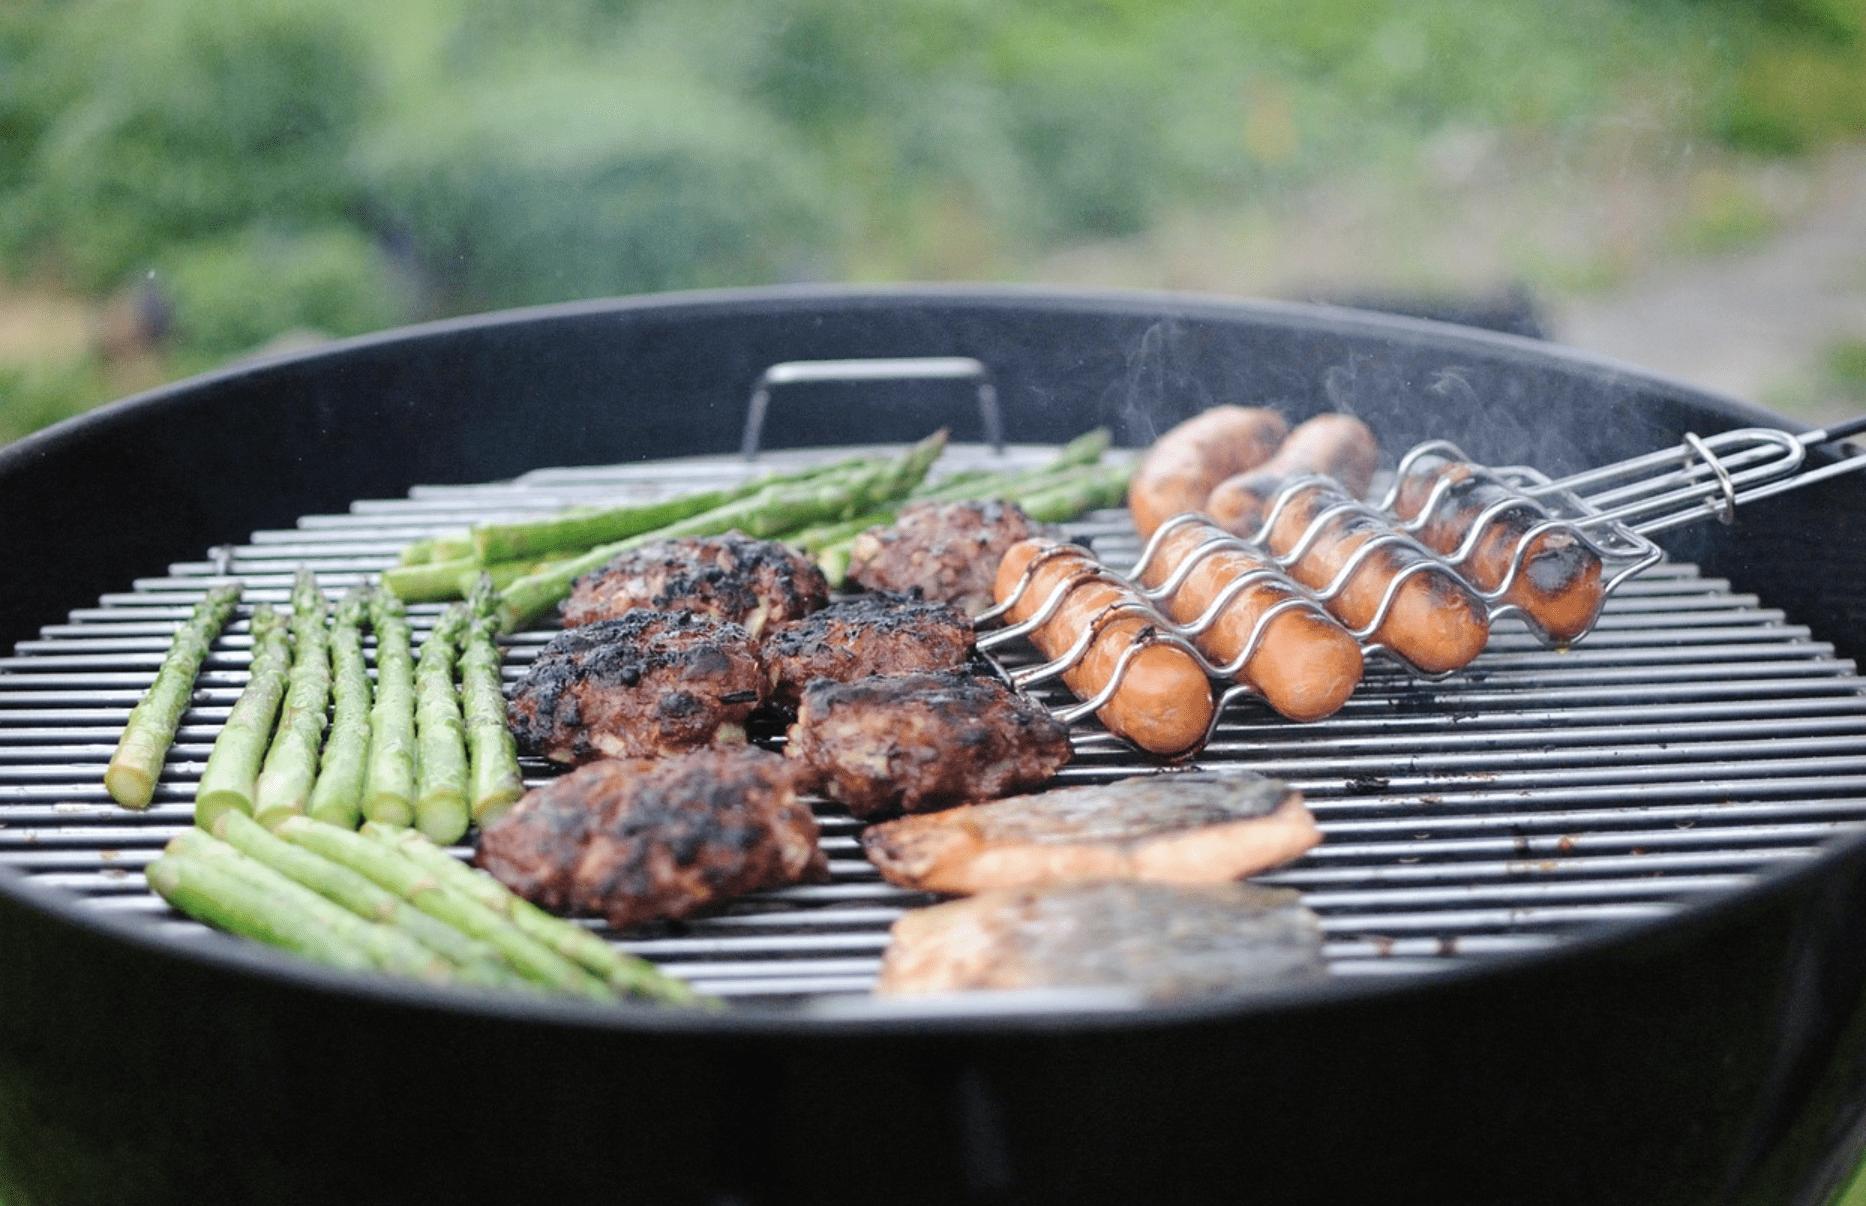 Le barbecue entre amis